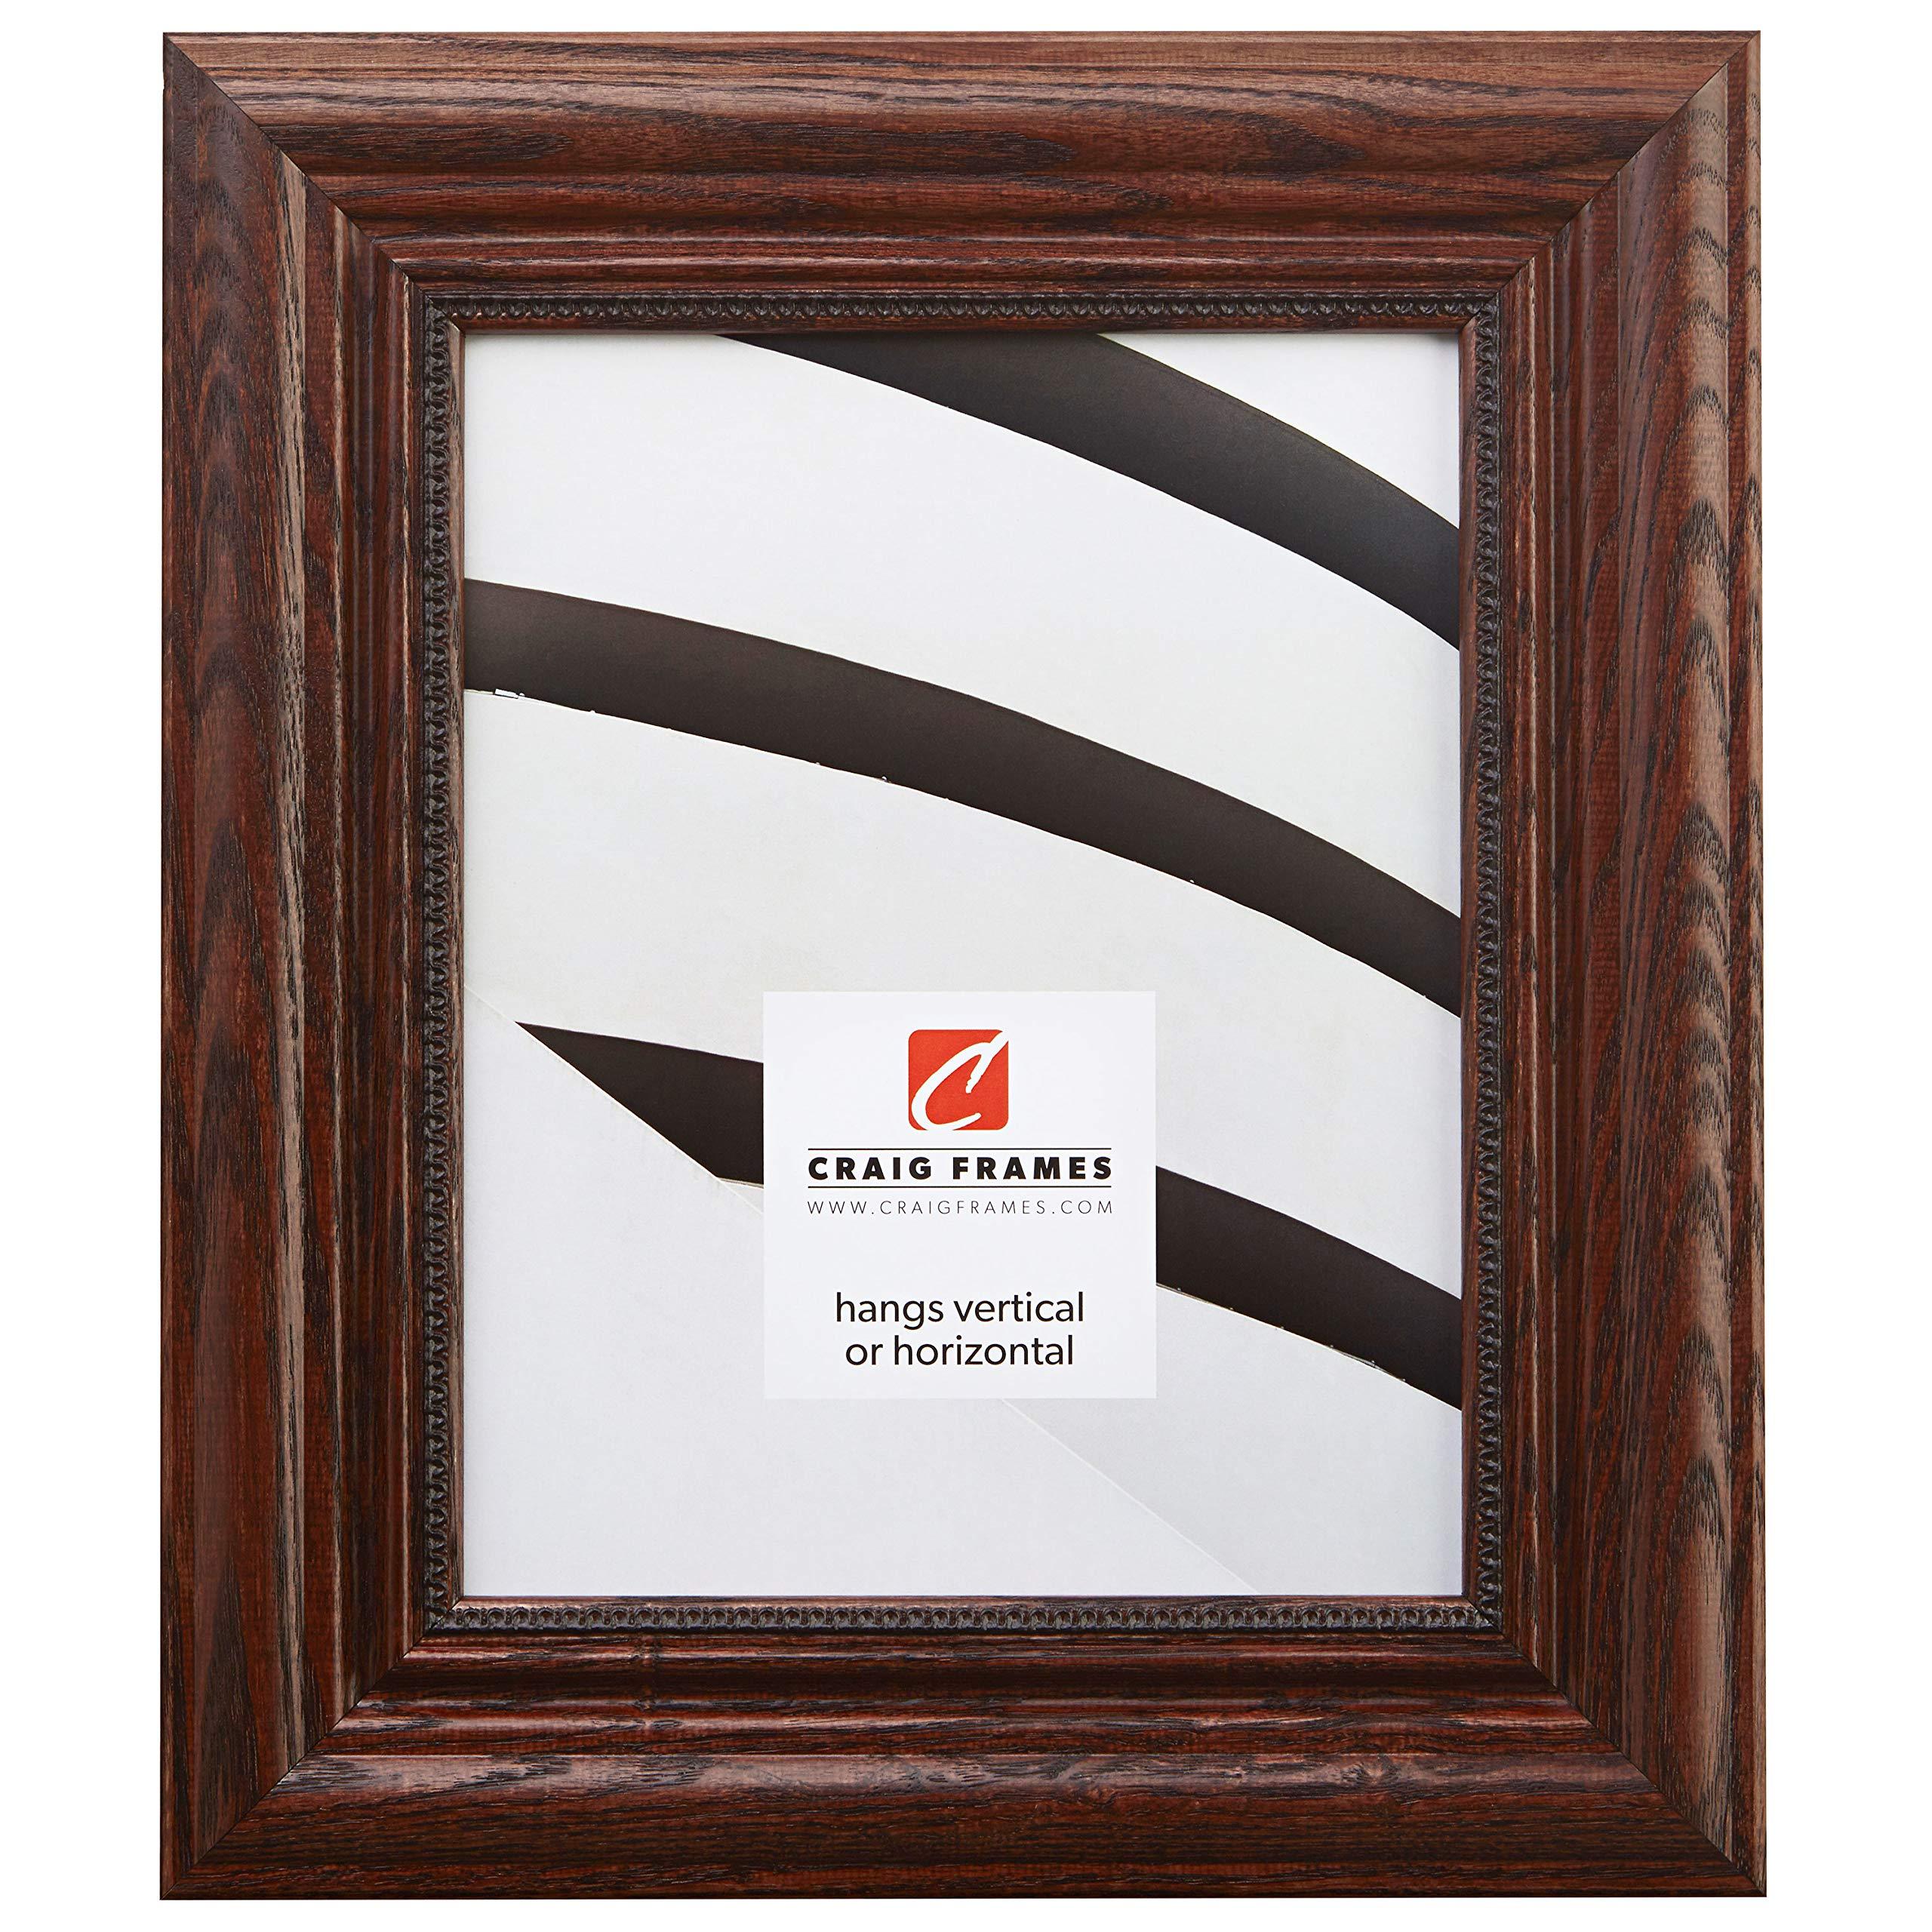 Craig Frames 15177483150 24 by 30-Inch Picture Frame, Solid Wood, 2.25-Inch Wide, Dark Walnut